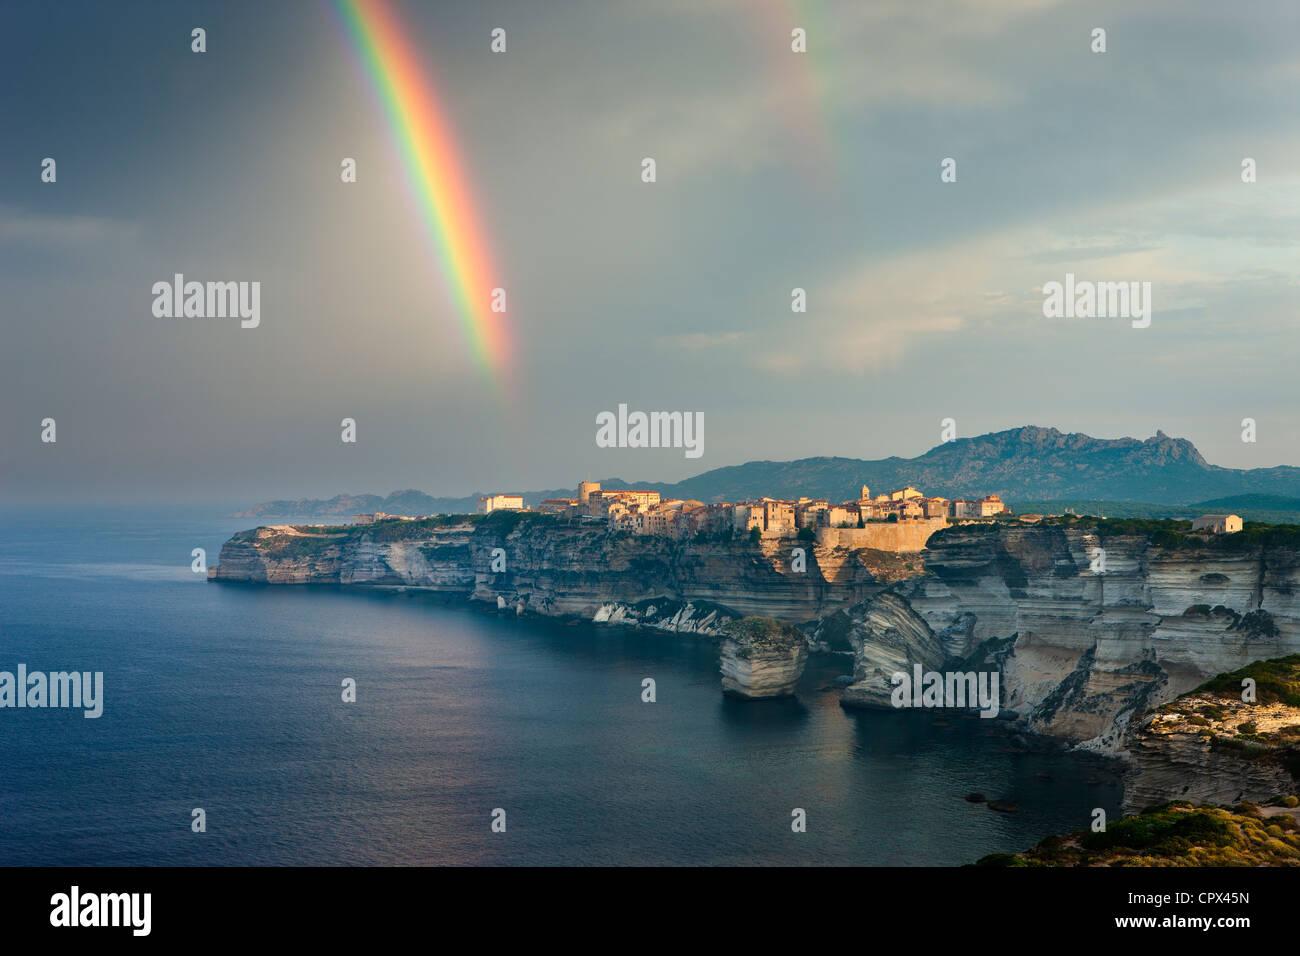 a rainbow over Bonifacio, Corsica, France - Stock Image